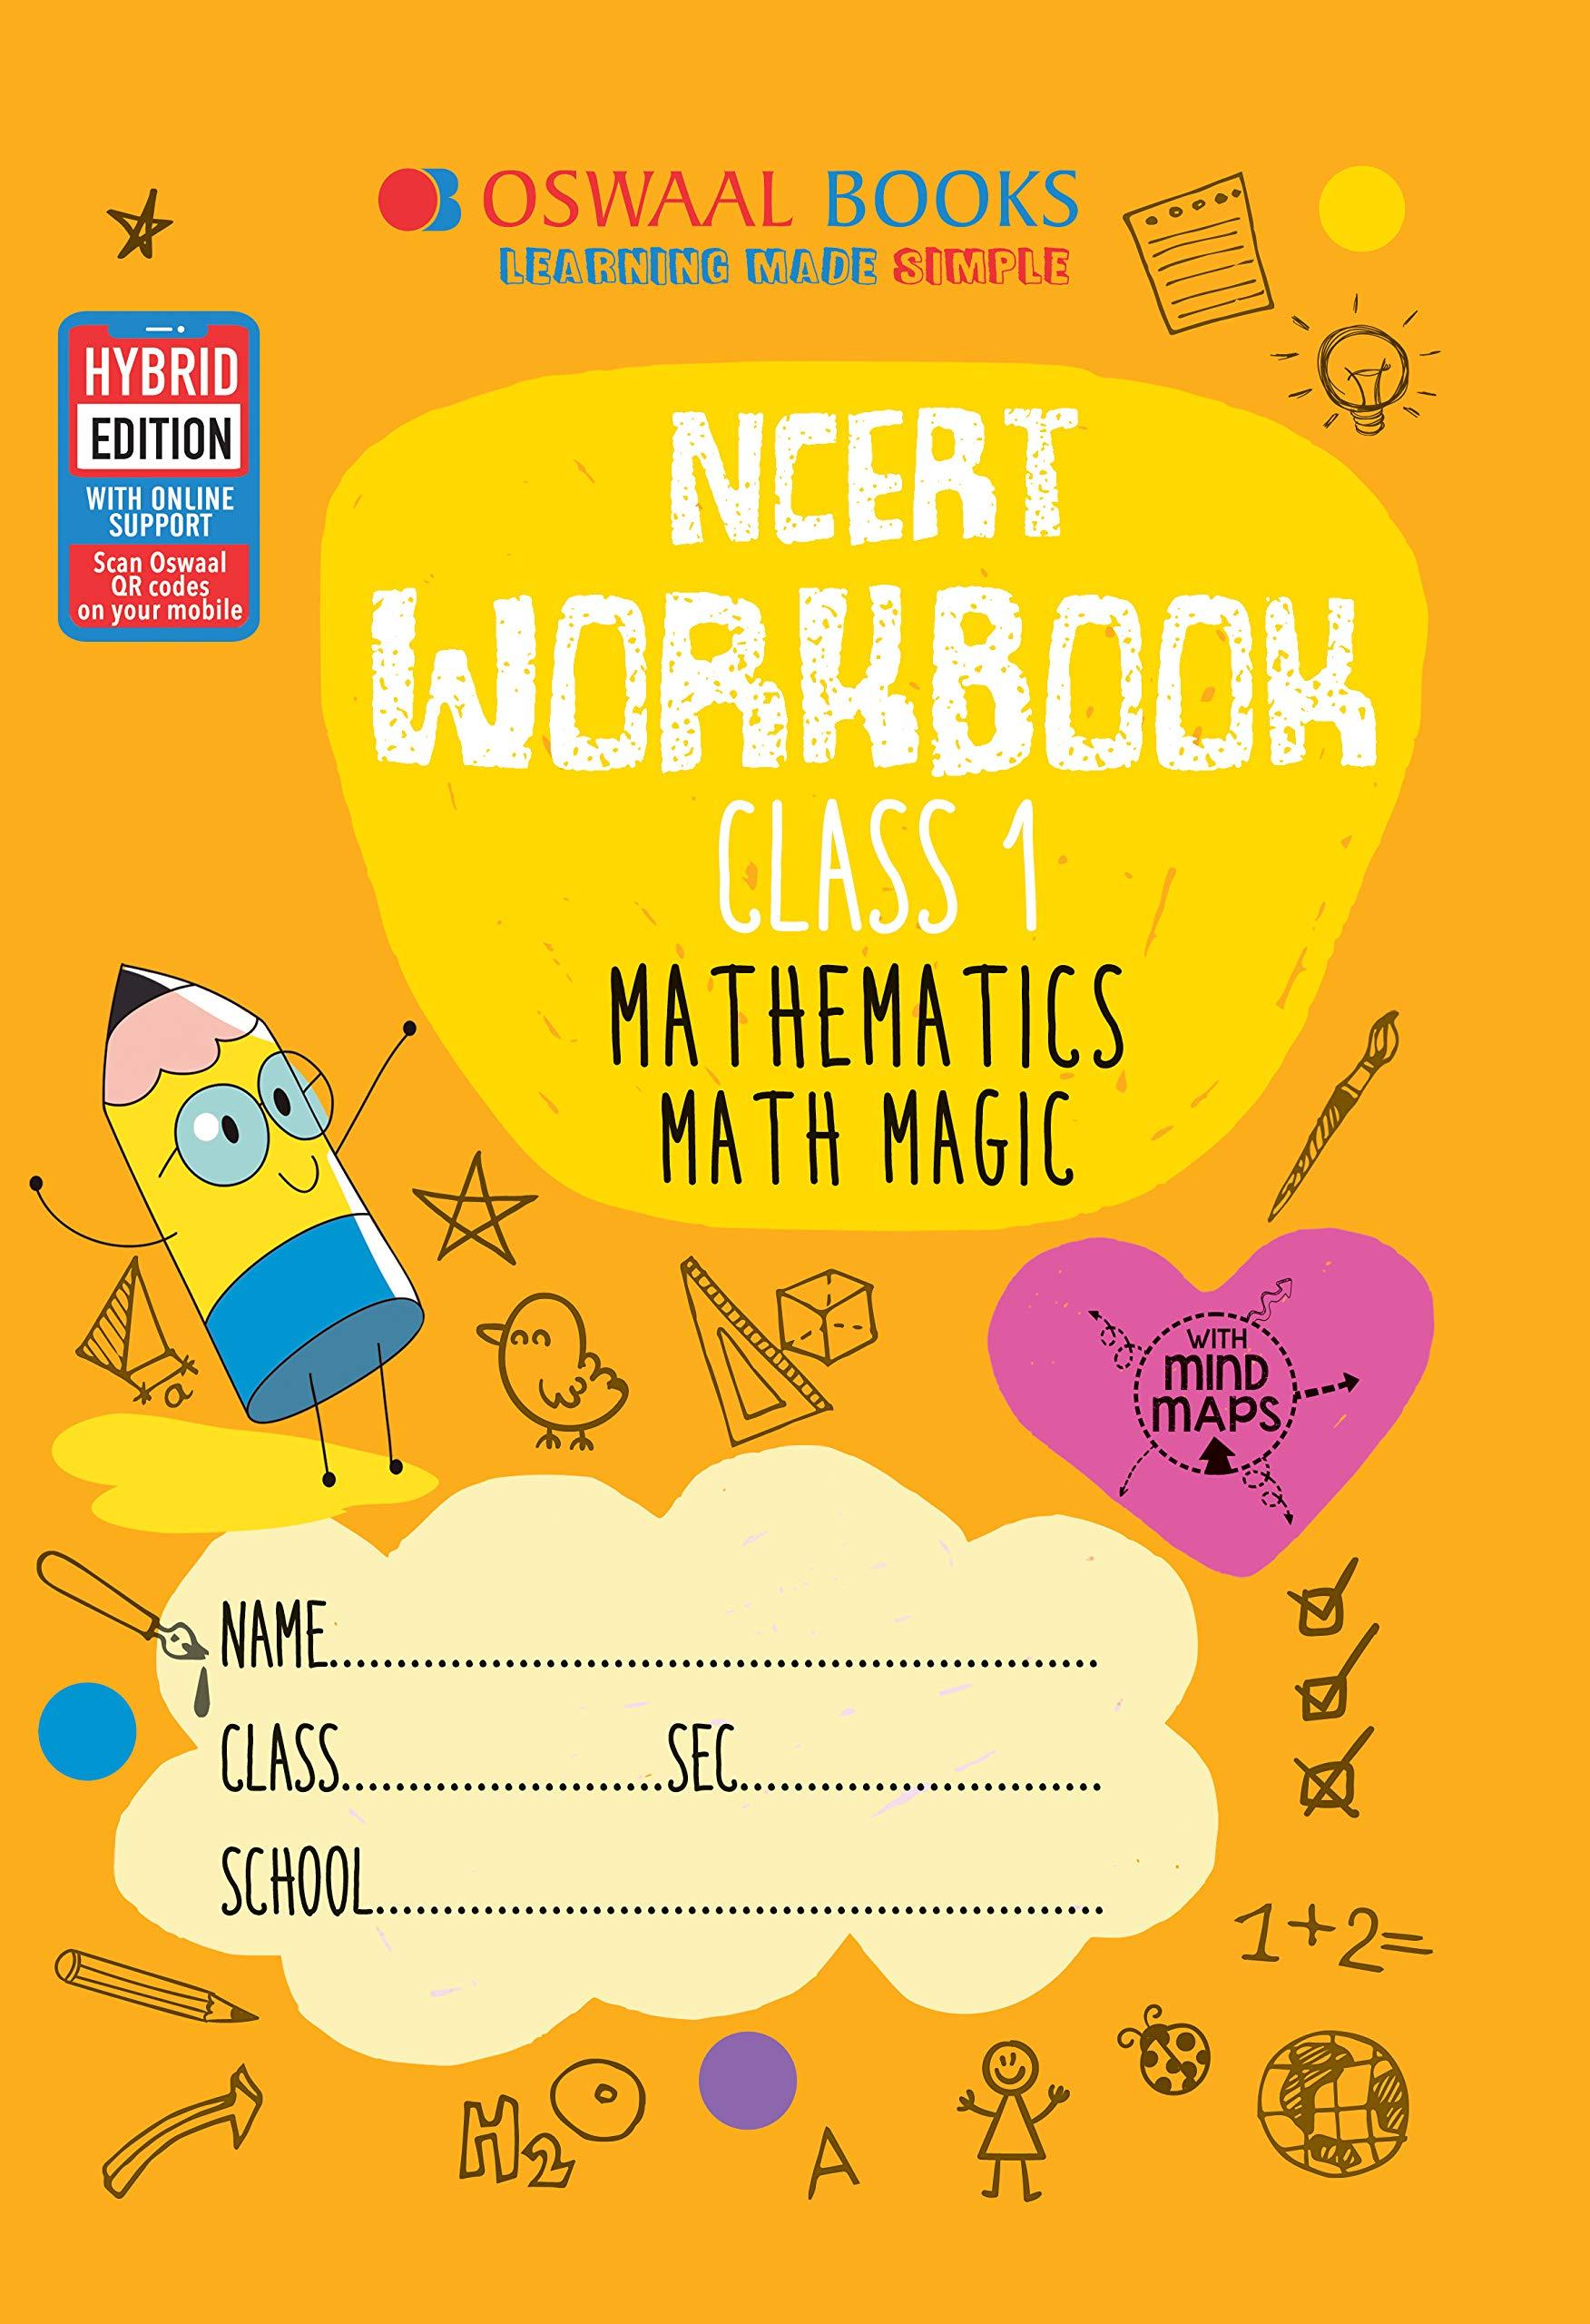 Oswaal Ncert Workbook Class 1 Mathematics Math Magic Book Amazon In Oswaal Books Learning Pvt Ltd Books